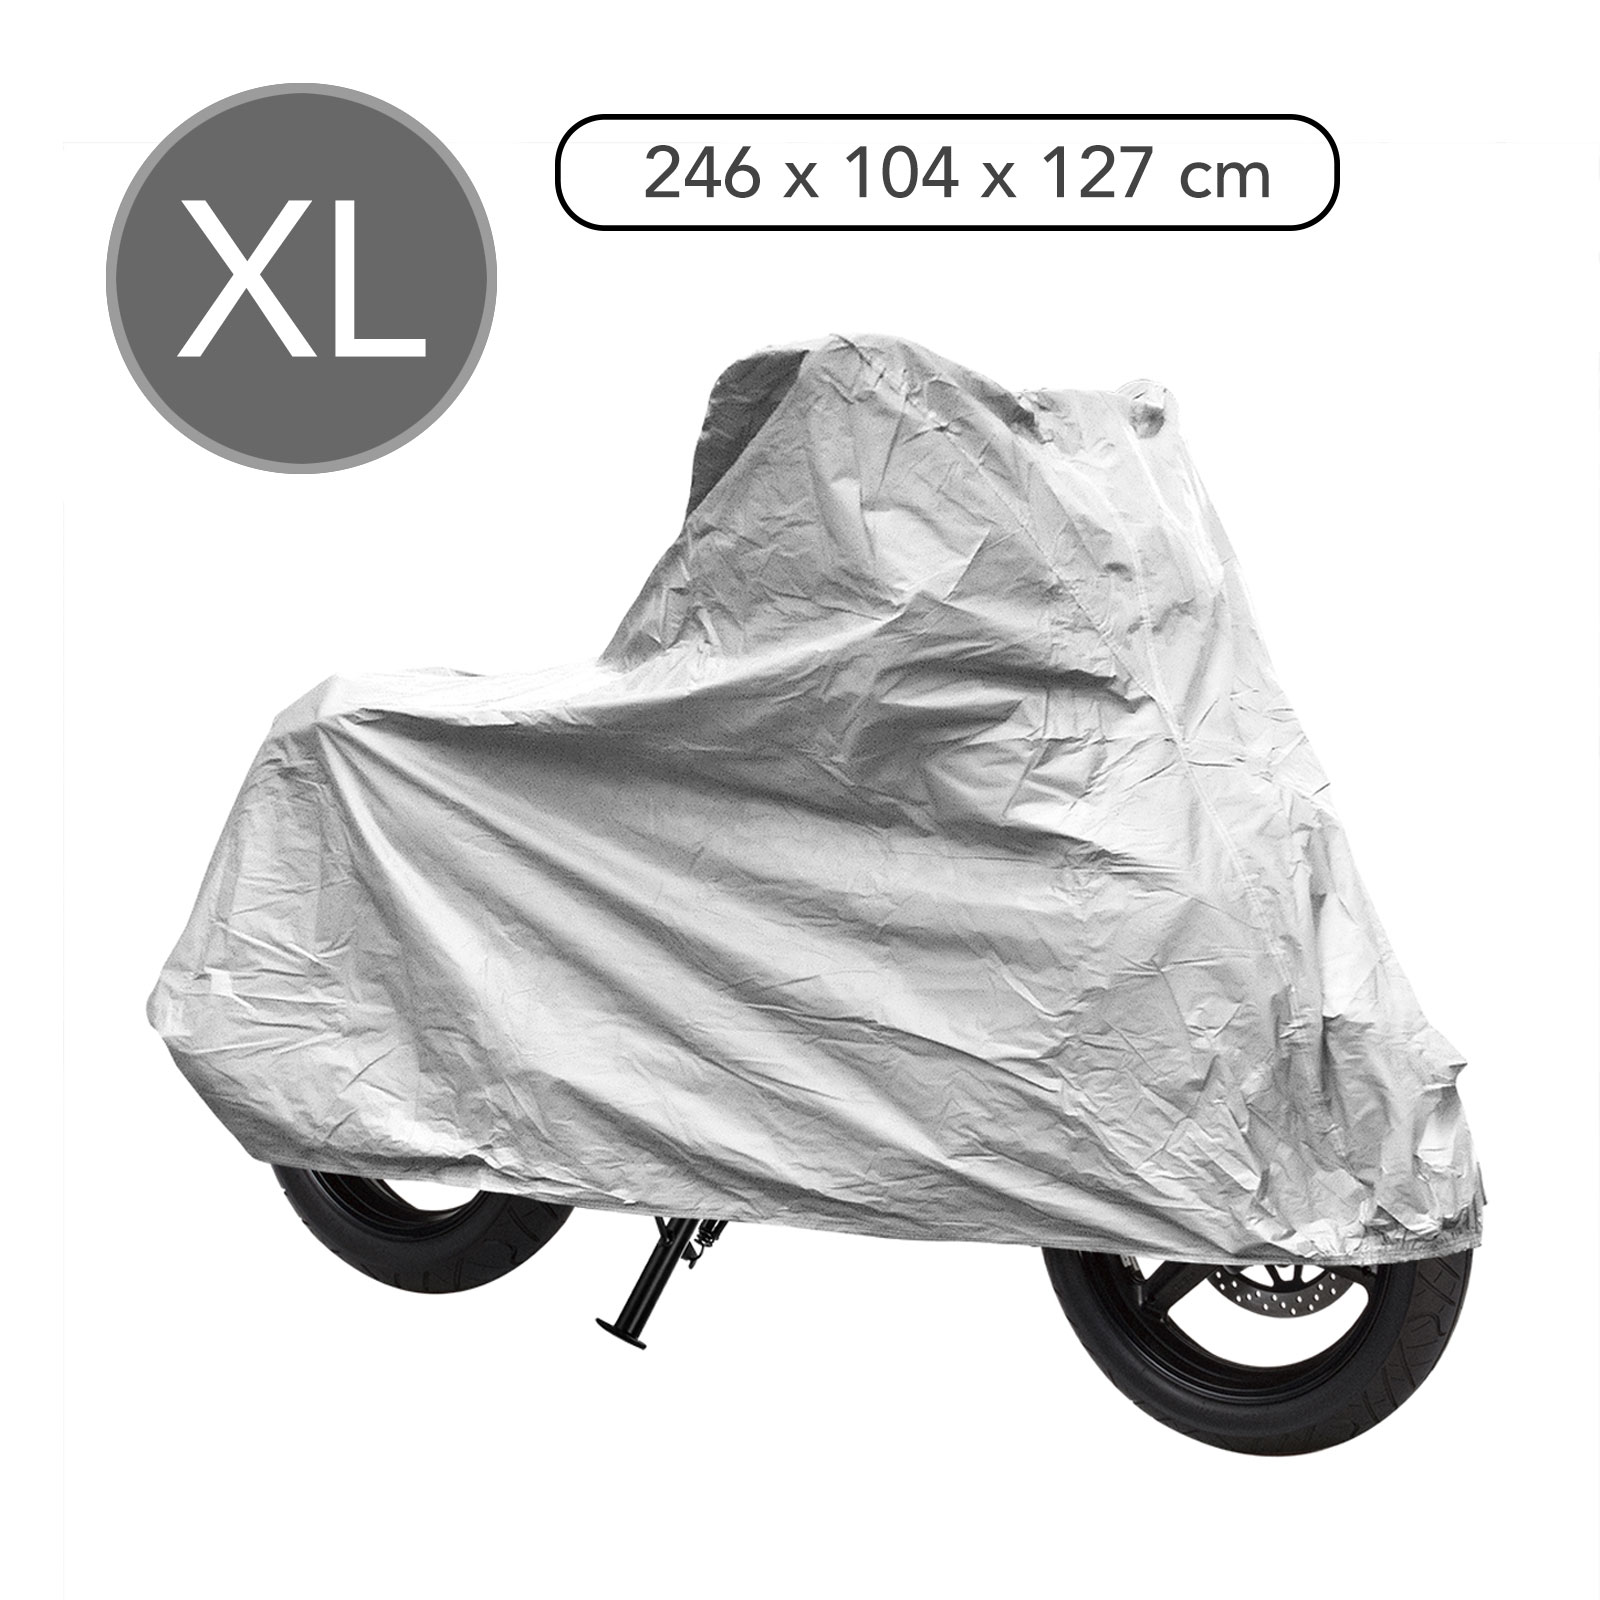 Motorrad & Roller Abdeckplane XL grau 246x104x127 cm Pva doppelt abgenäht 🏍️